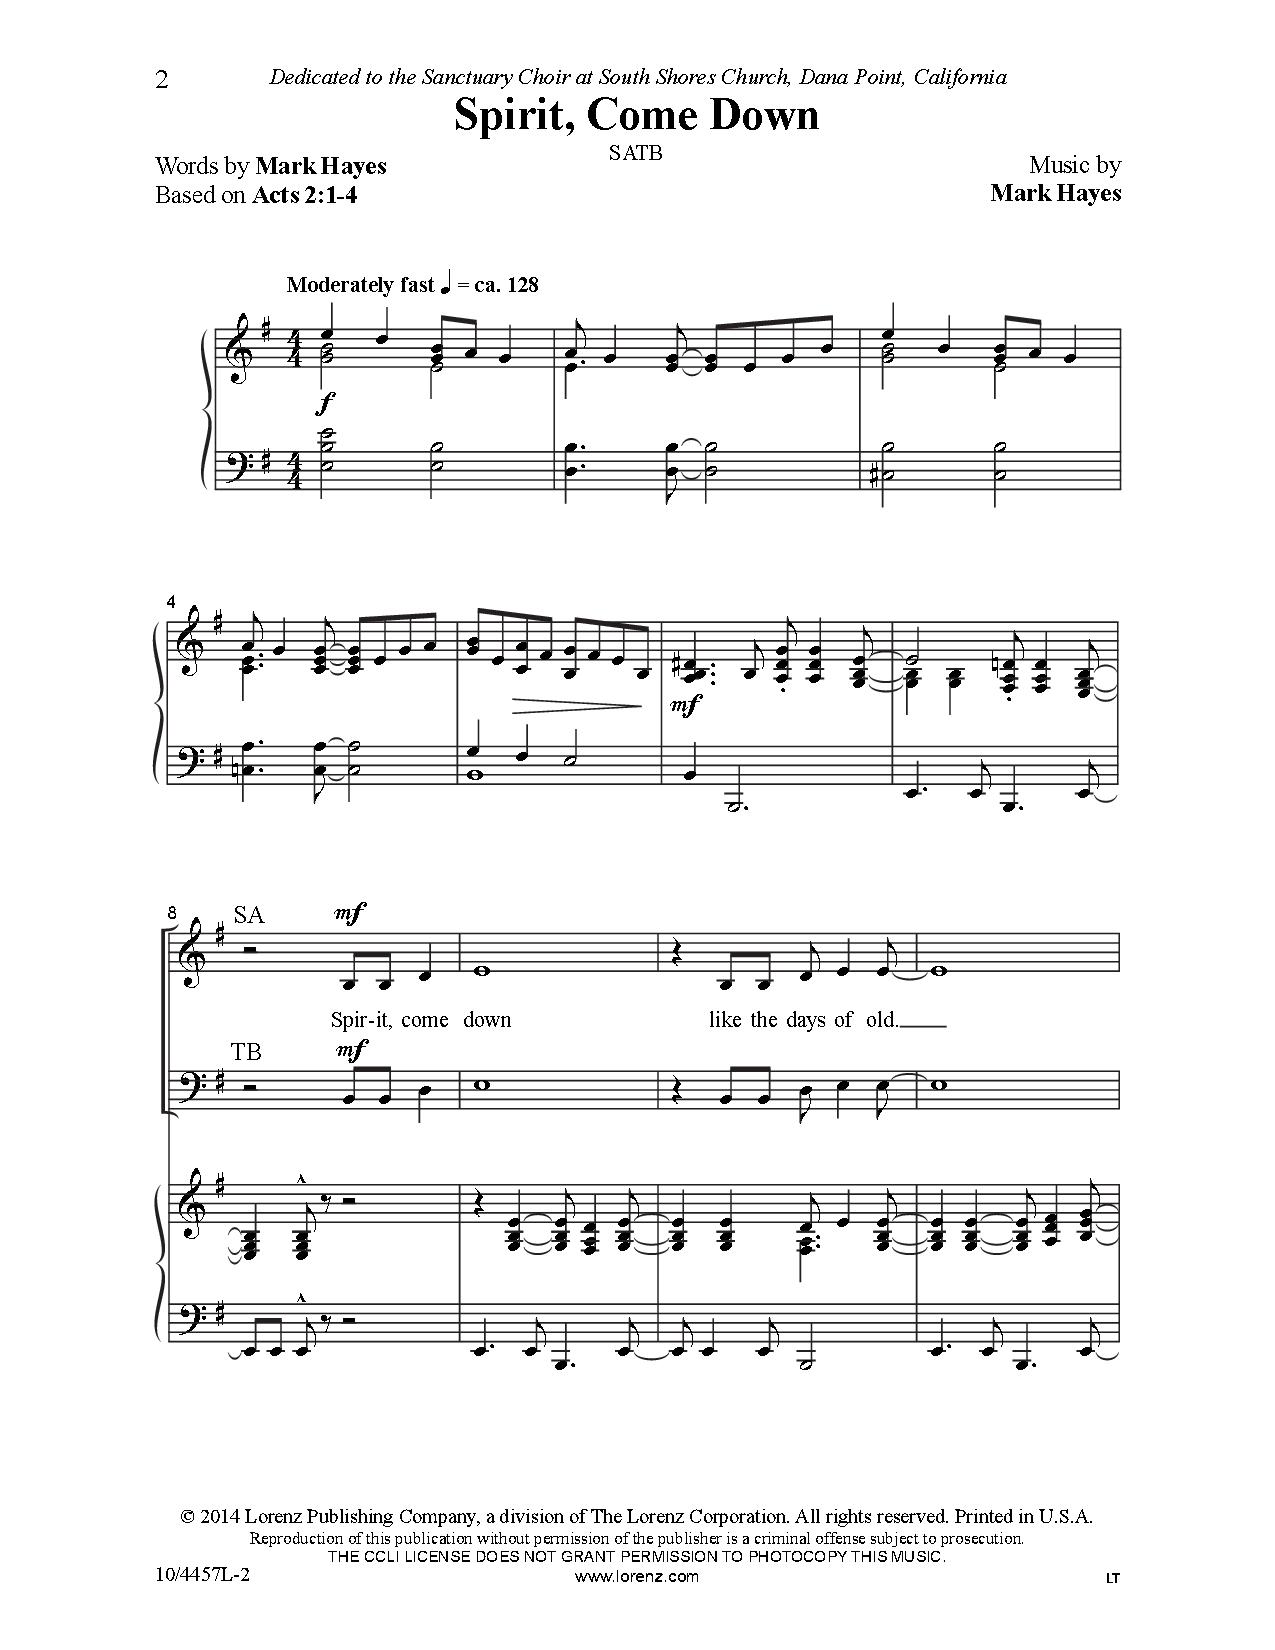 The Servant Song Sheet Music Ibovnathandedecker